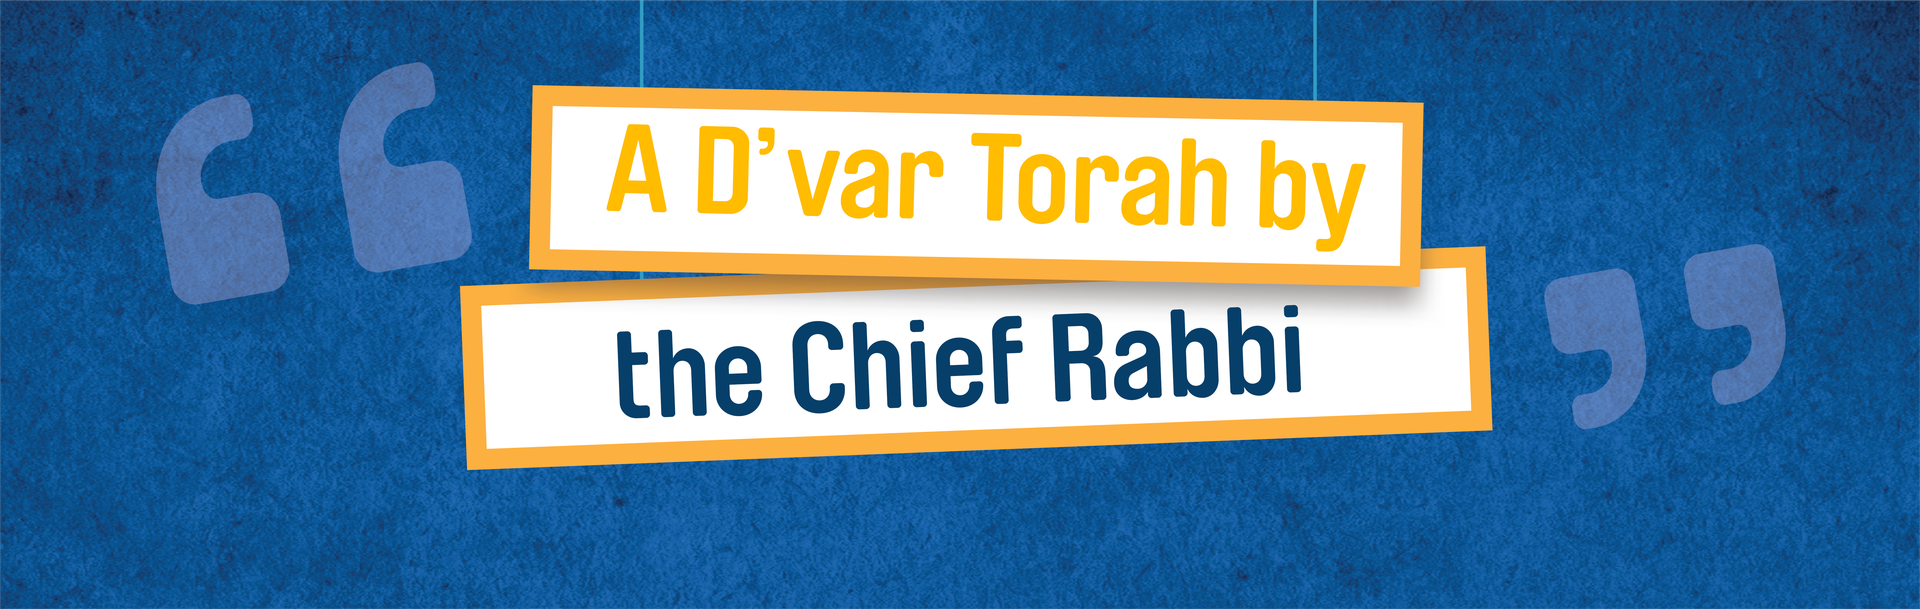 A D'var Torah by the Chief Rabbi